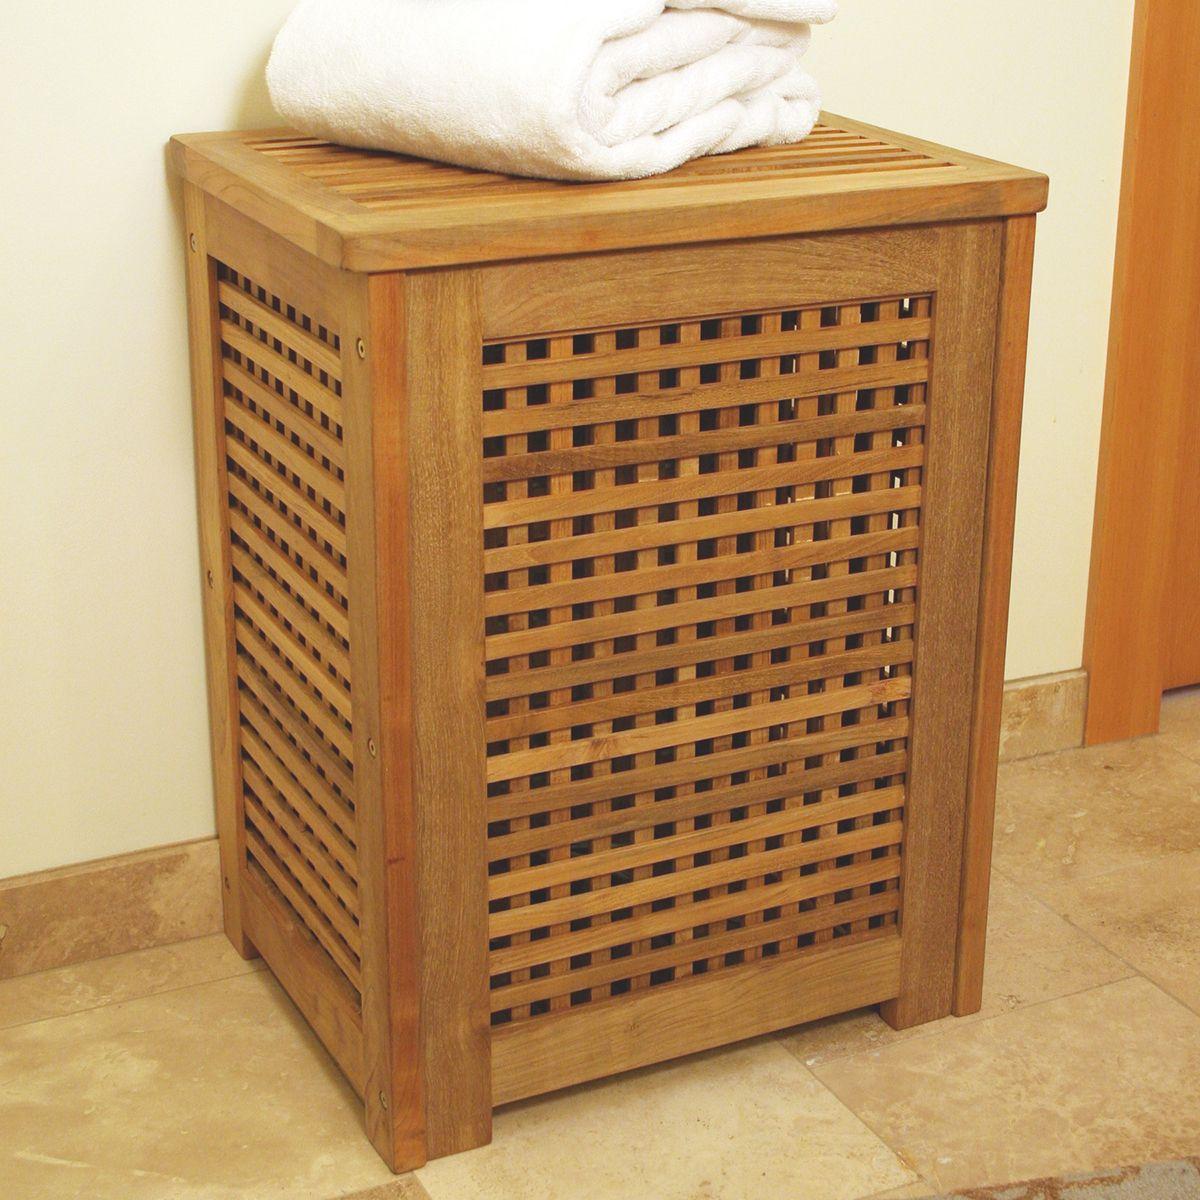 Holz Wasche Korb Design Ideen Waschesammler Selber Bauen Pinterest